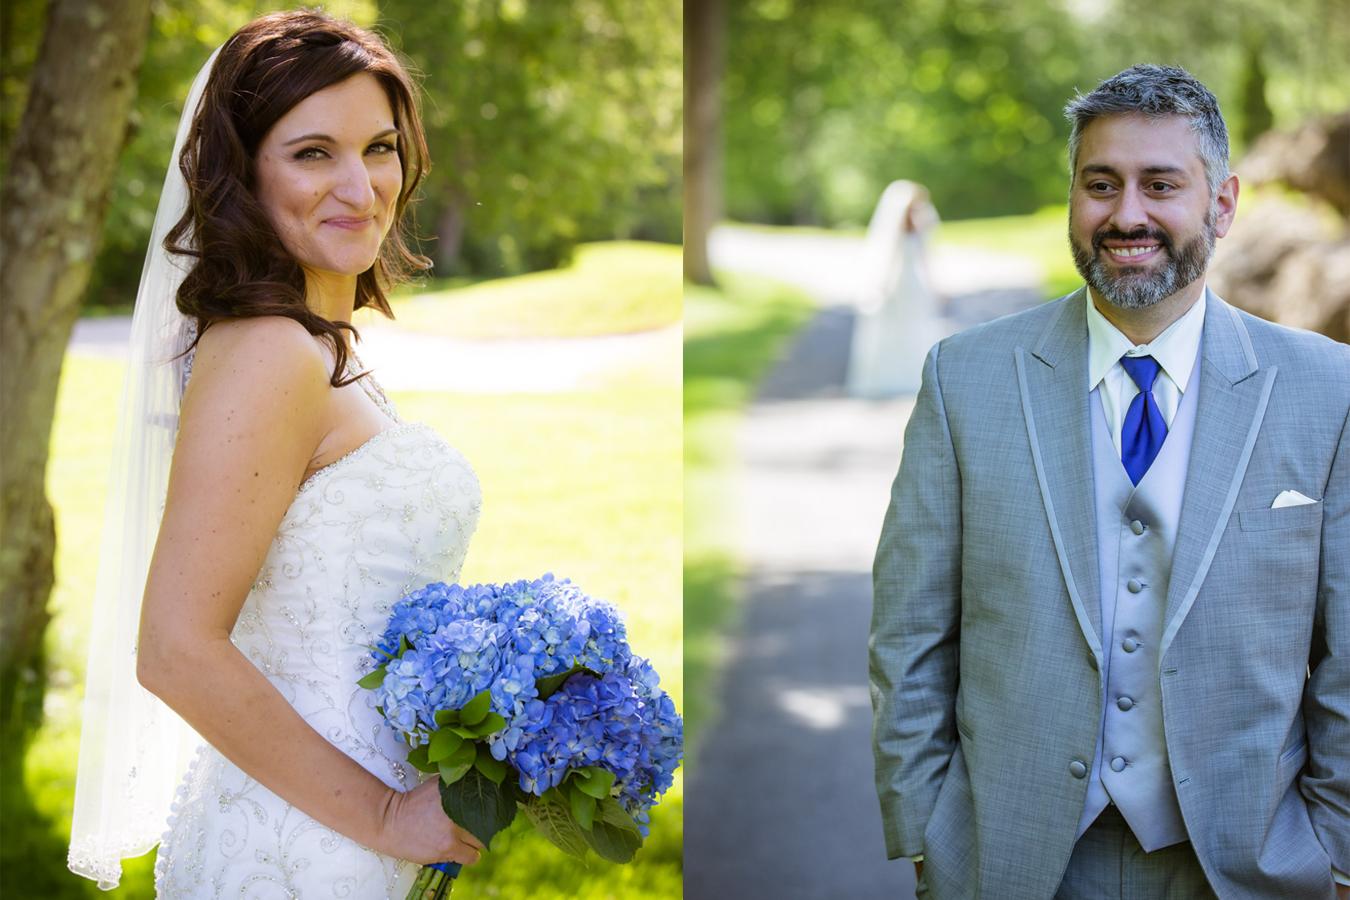 NEPA_Pocono_Weddings_Rob_Lettieri_Photography_04.jpg